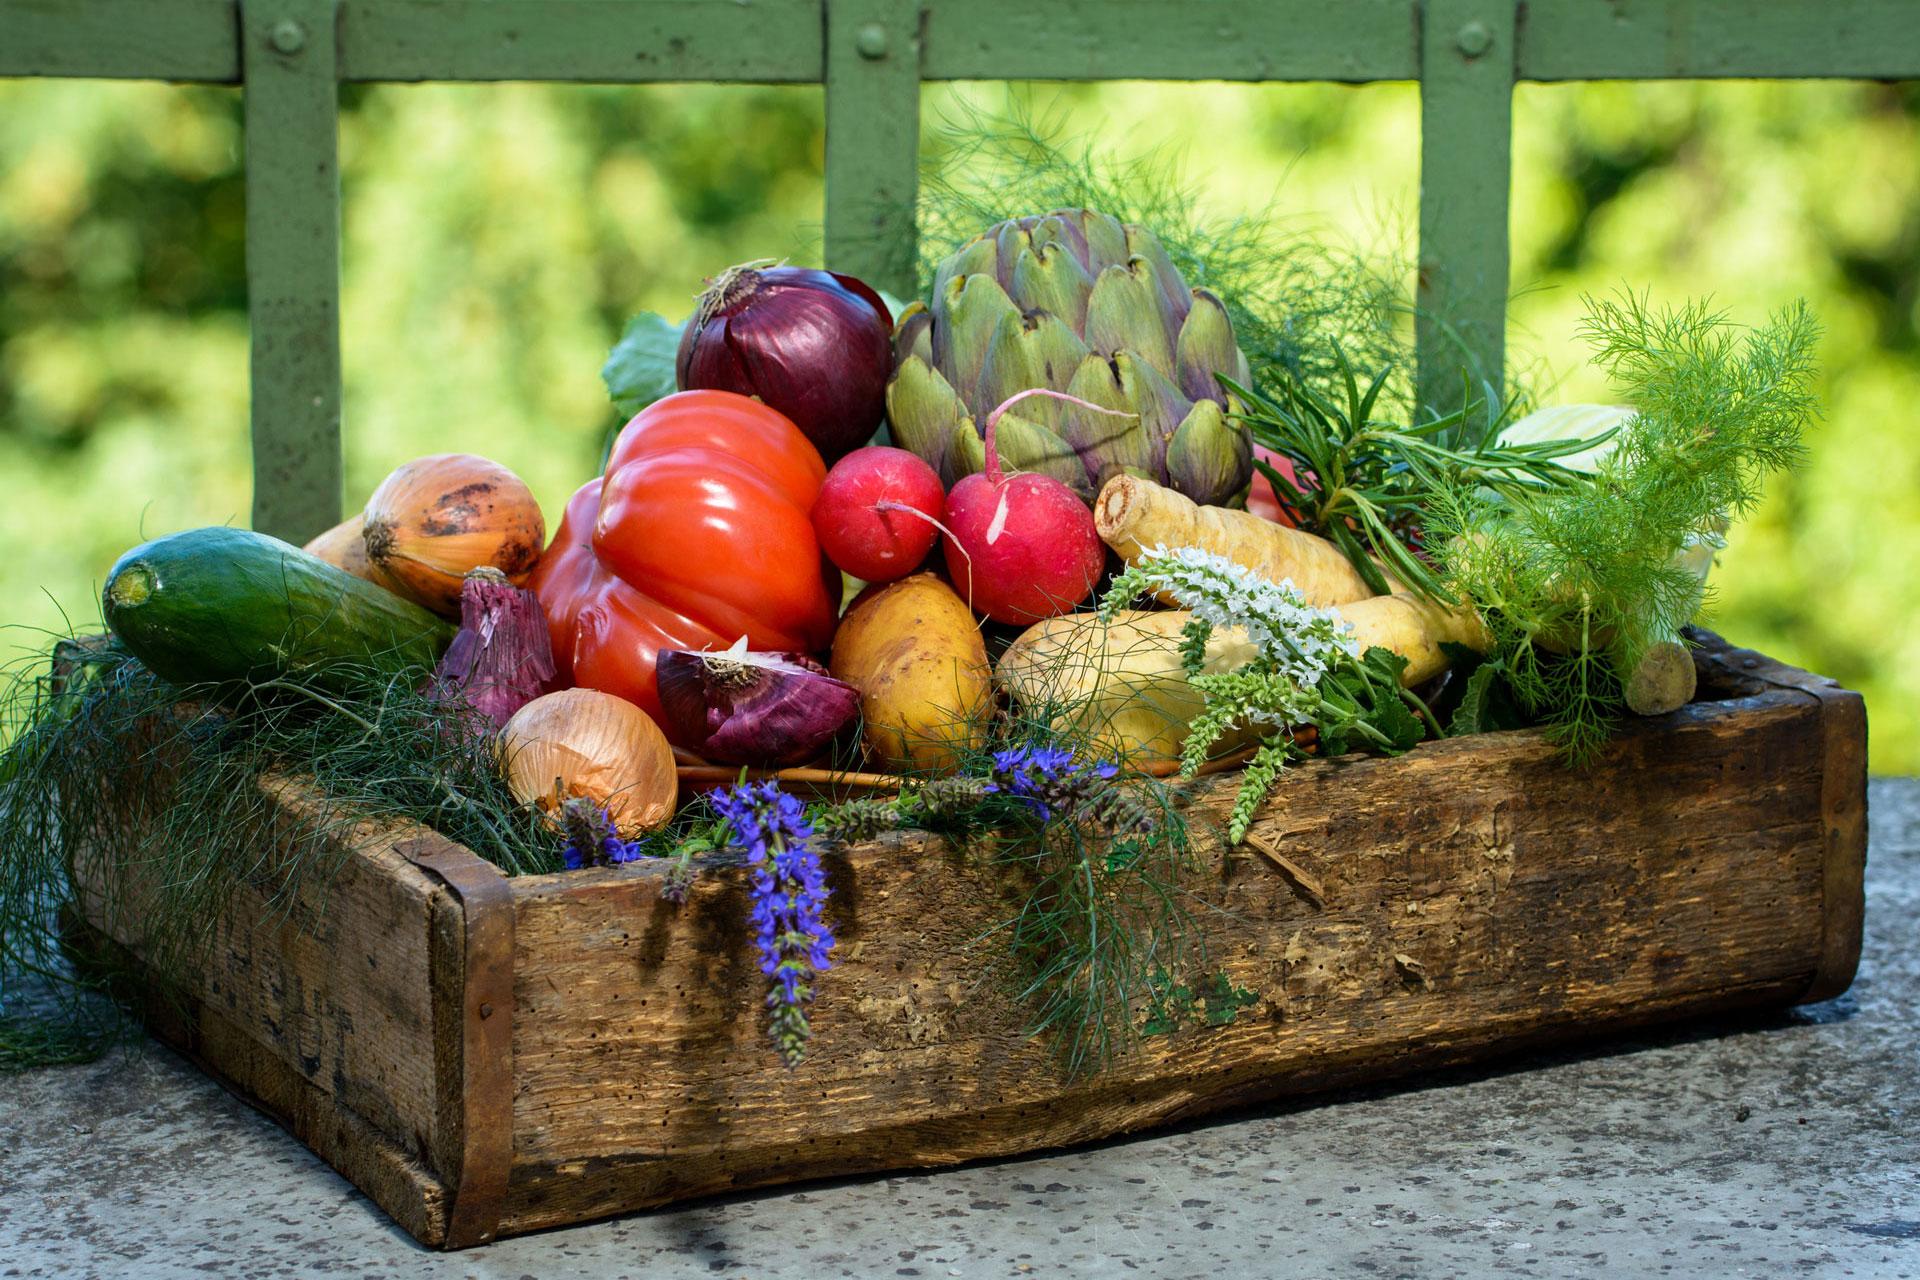 Ernährungsmedizin, ernährungsmedizinische Leistungen, Internist, Internisten, Ernährungsmediziner, gesunde Ernährung